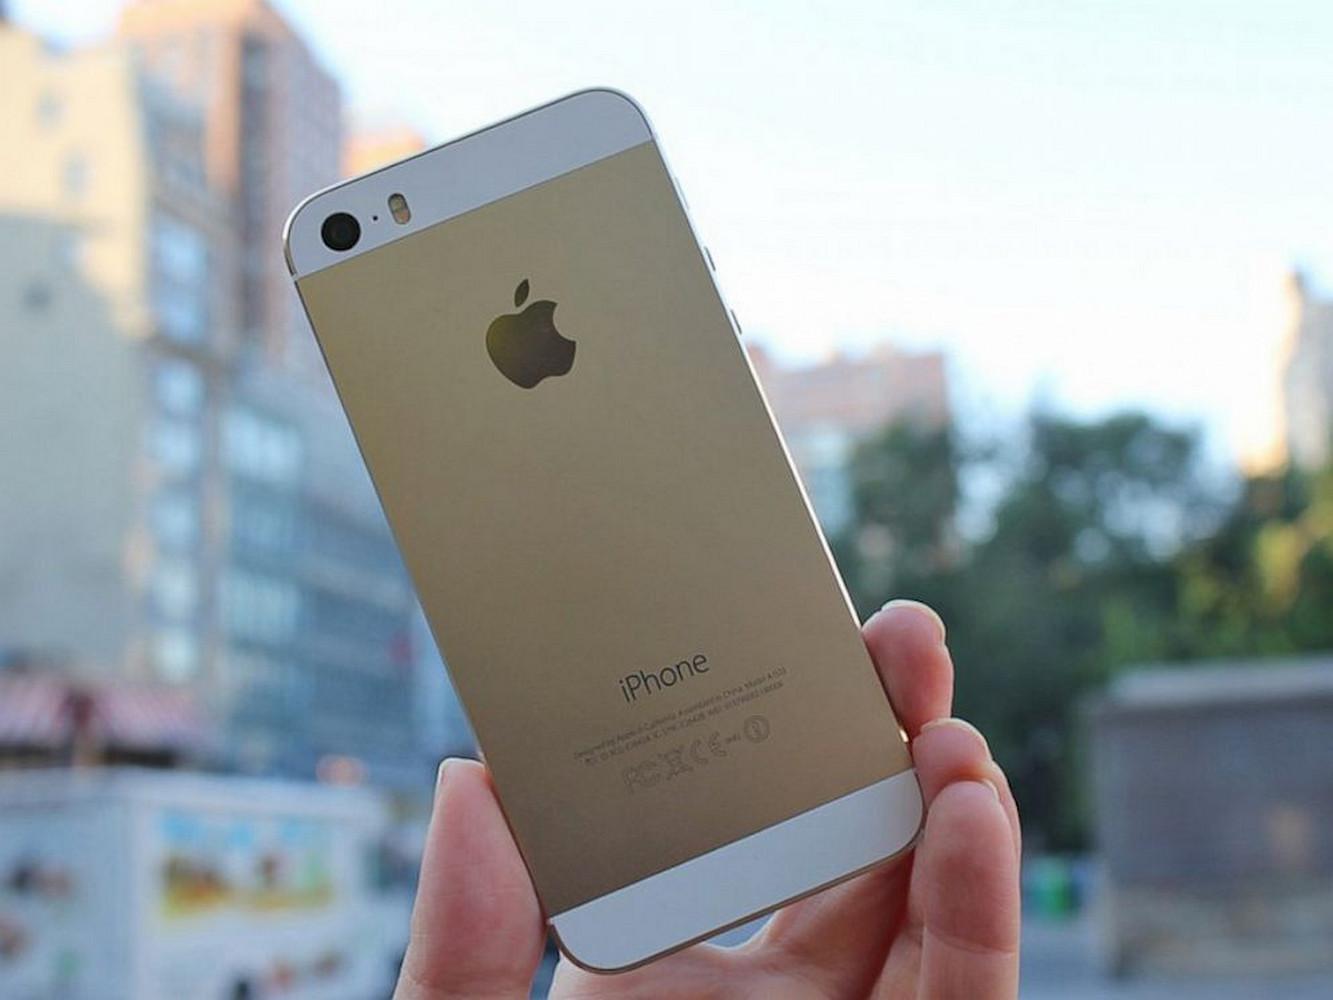 Apple-iPhone-5s-Unlocked-GSM-Unlocked-AT-amp-T-Verizon-T-Mobile-A1533 thumbnail 9